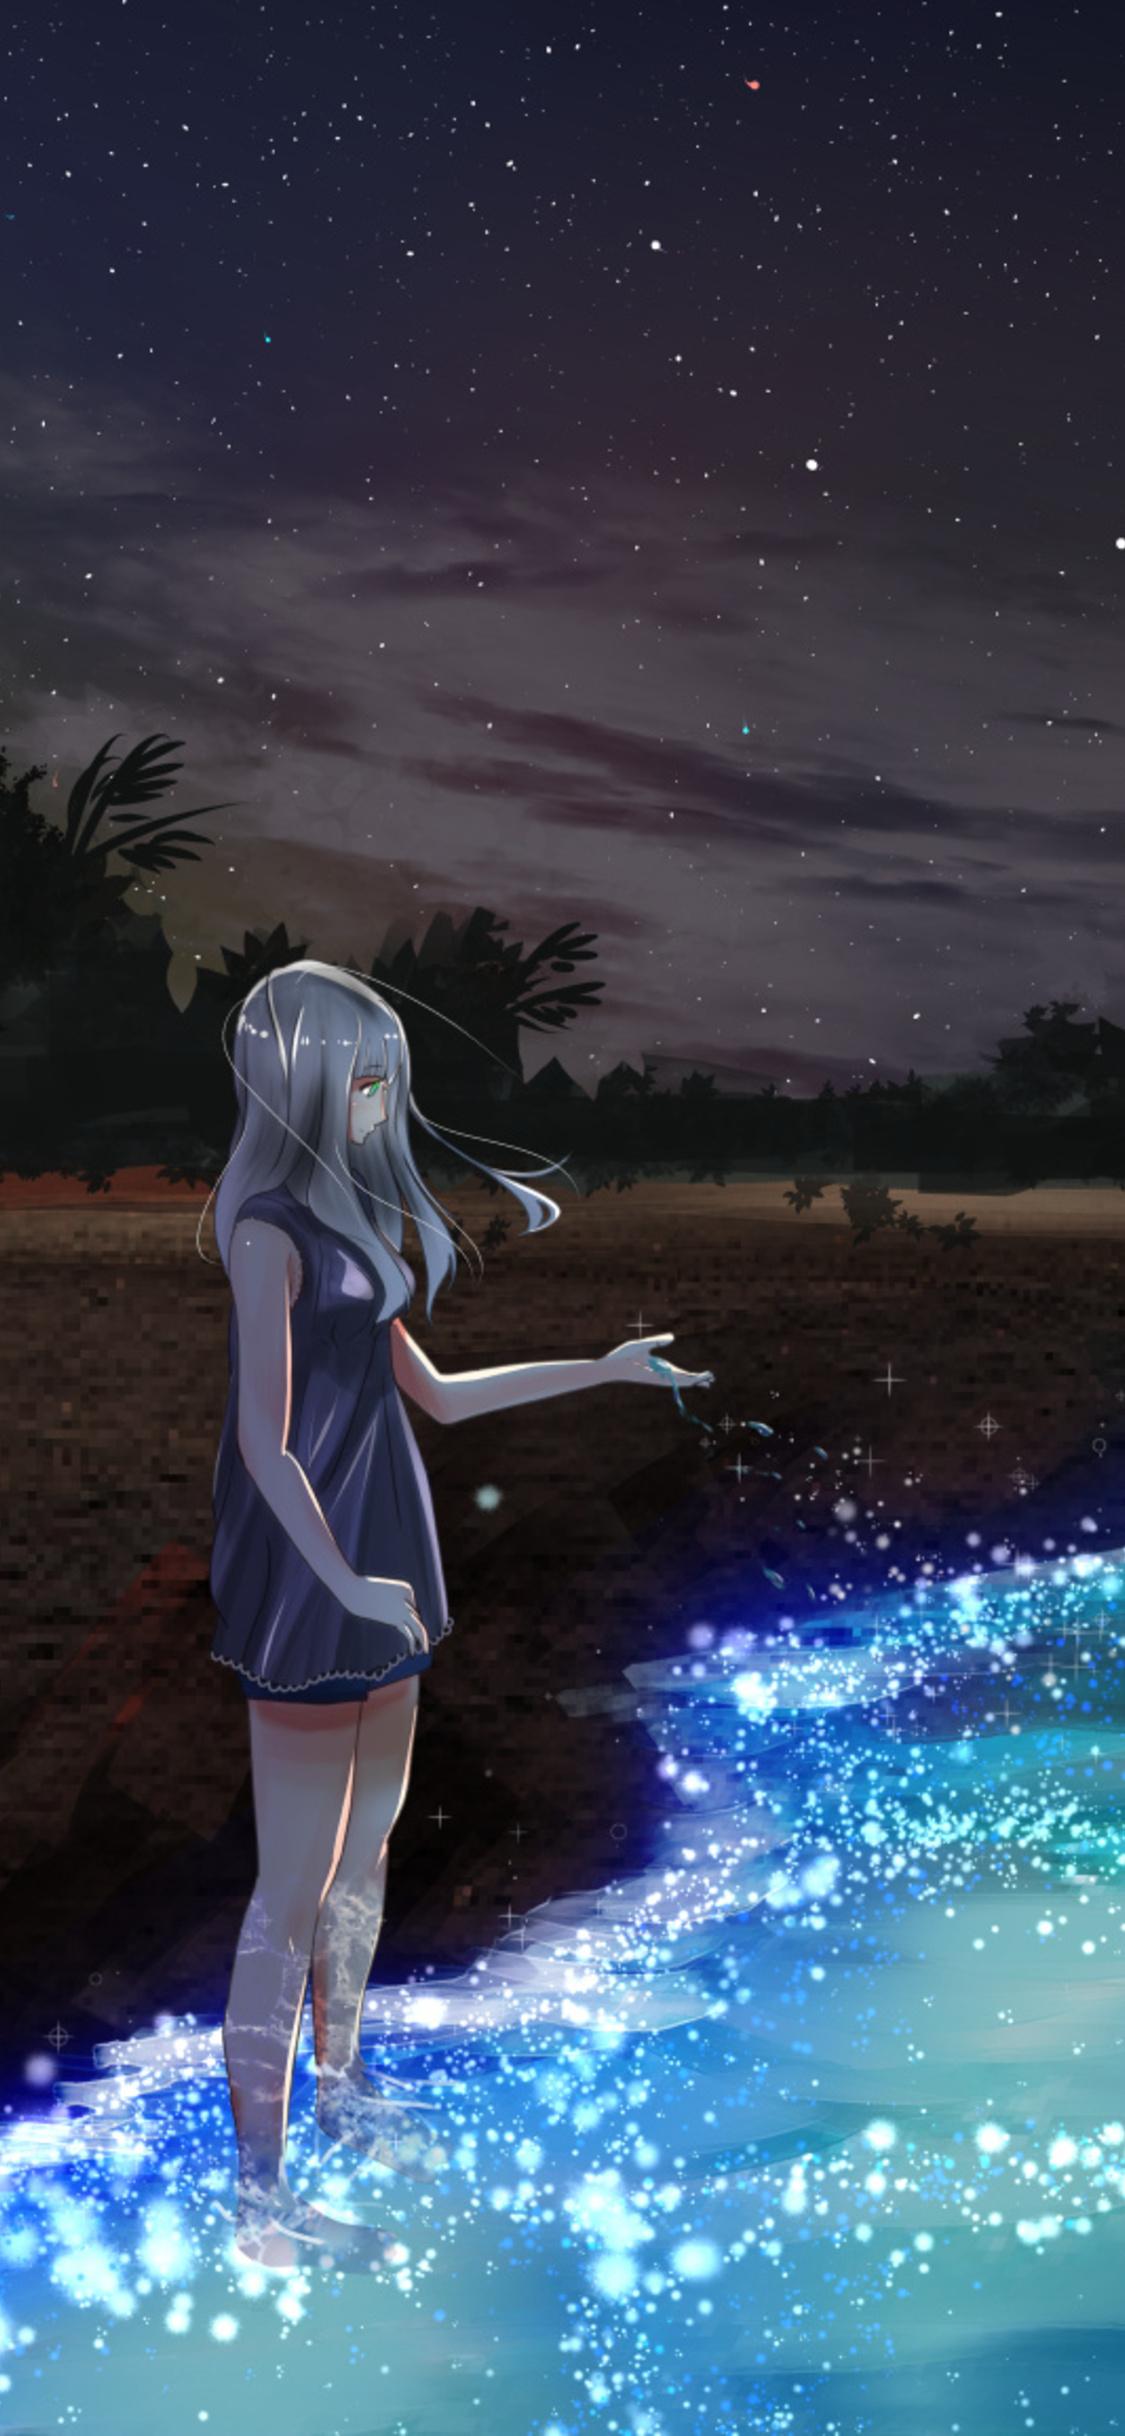 1125x2436 Anime Girl At Seashore Dark Moon Iphone Xs Iphone 10